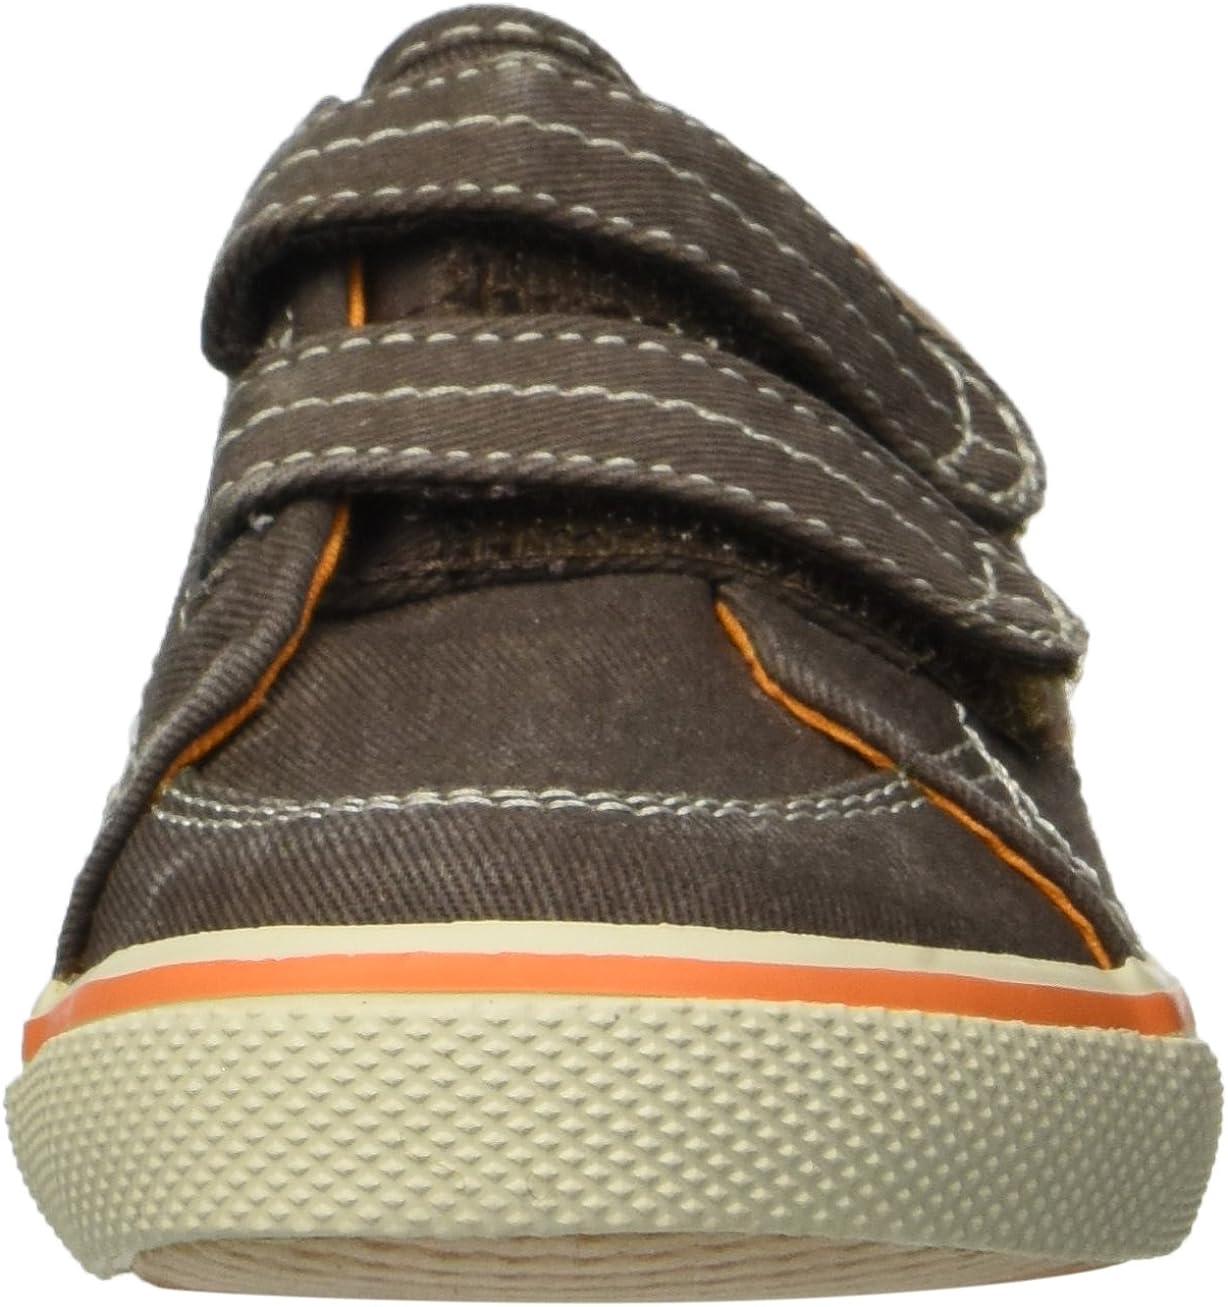 Amazon.com: Sperry Halyard Hook & Loop - Zapatos ...